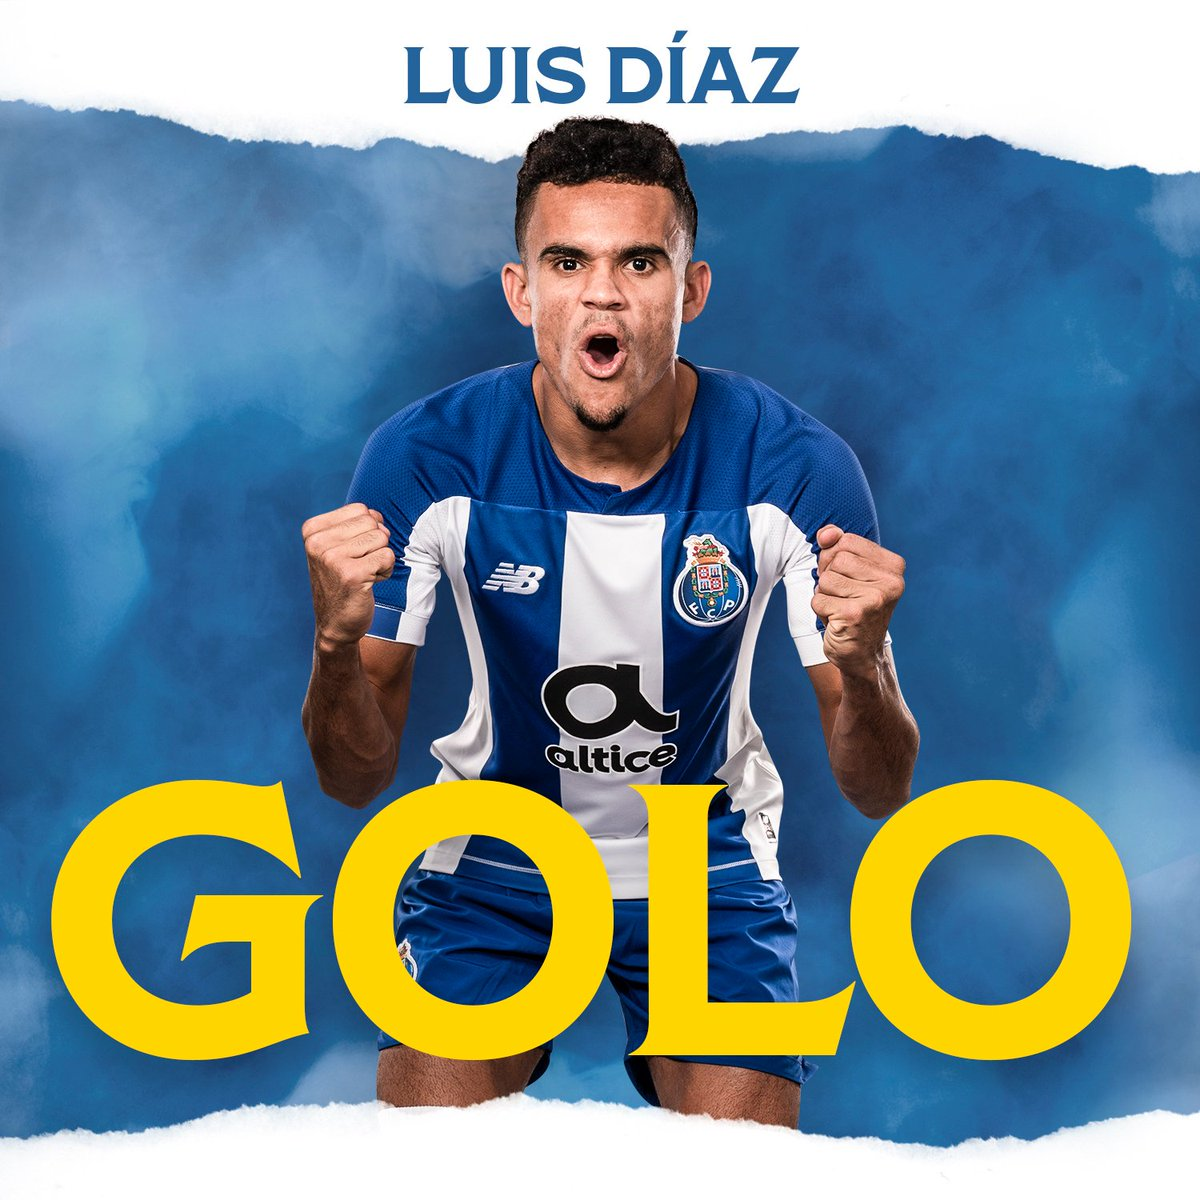 ⚽76' GOLO! / GOAL! / ¡GOL!  🔵⚪FC Porto 2-3 FC Krasnodar  #FCPorto #UCL #FCPFCK https://t.co/cP7JPqG7ir